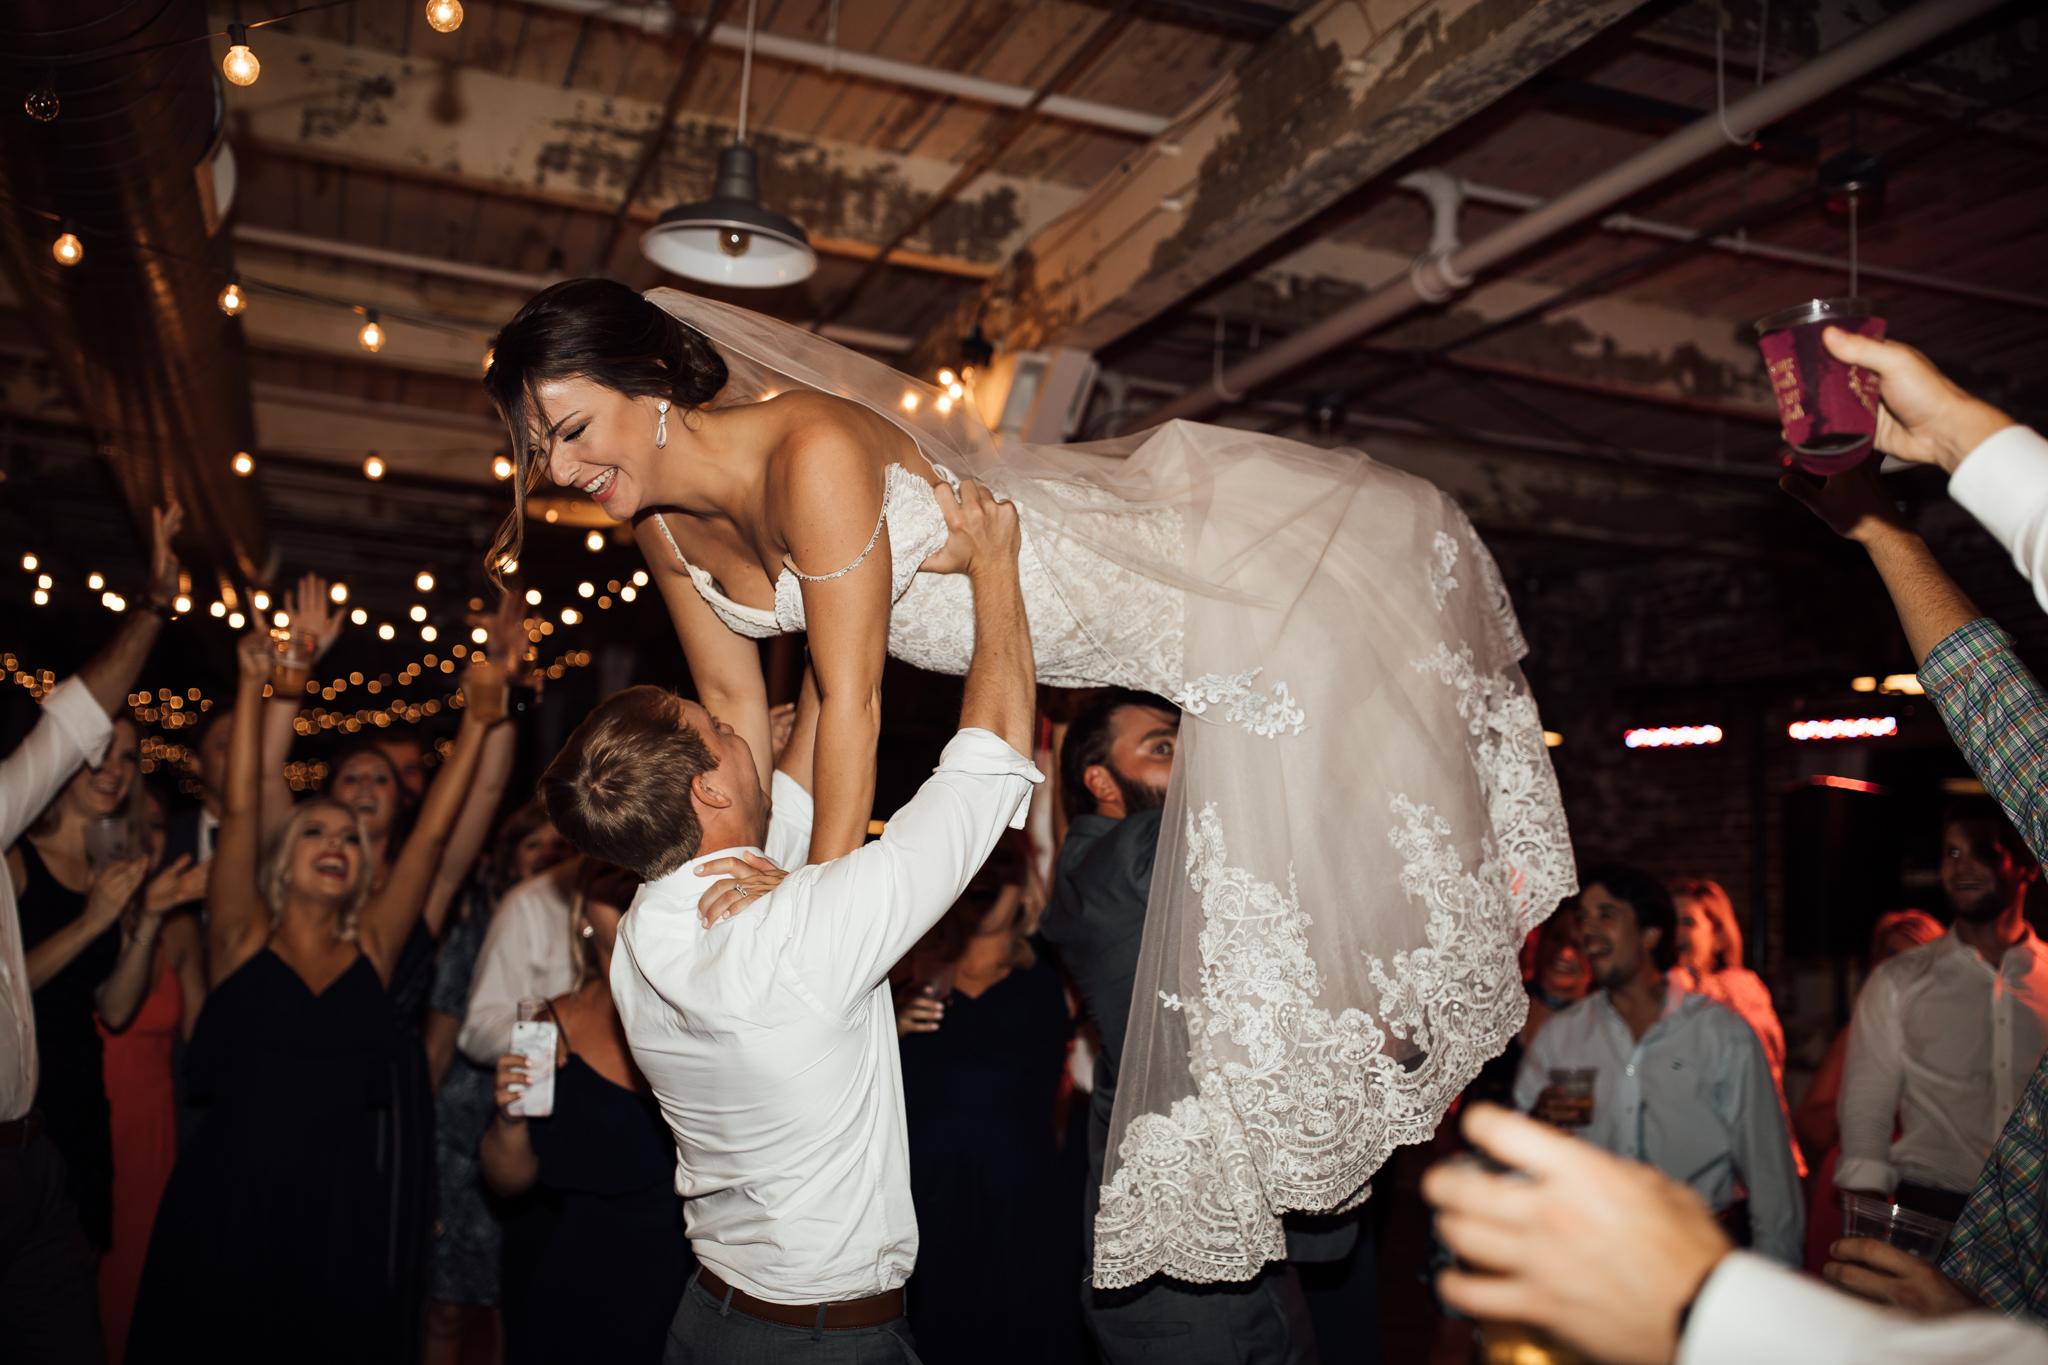 409smain-downtown-memphis-wedding-venue-thewarmtharoundyou (223 of 243).jpg